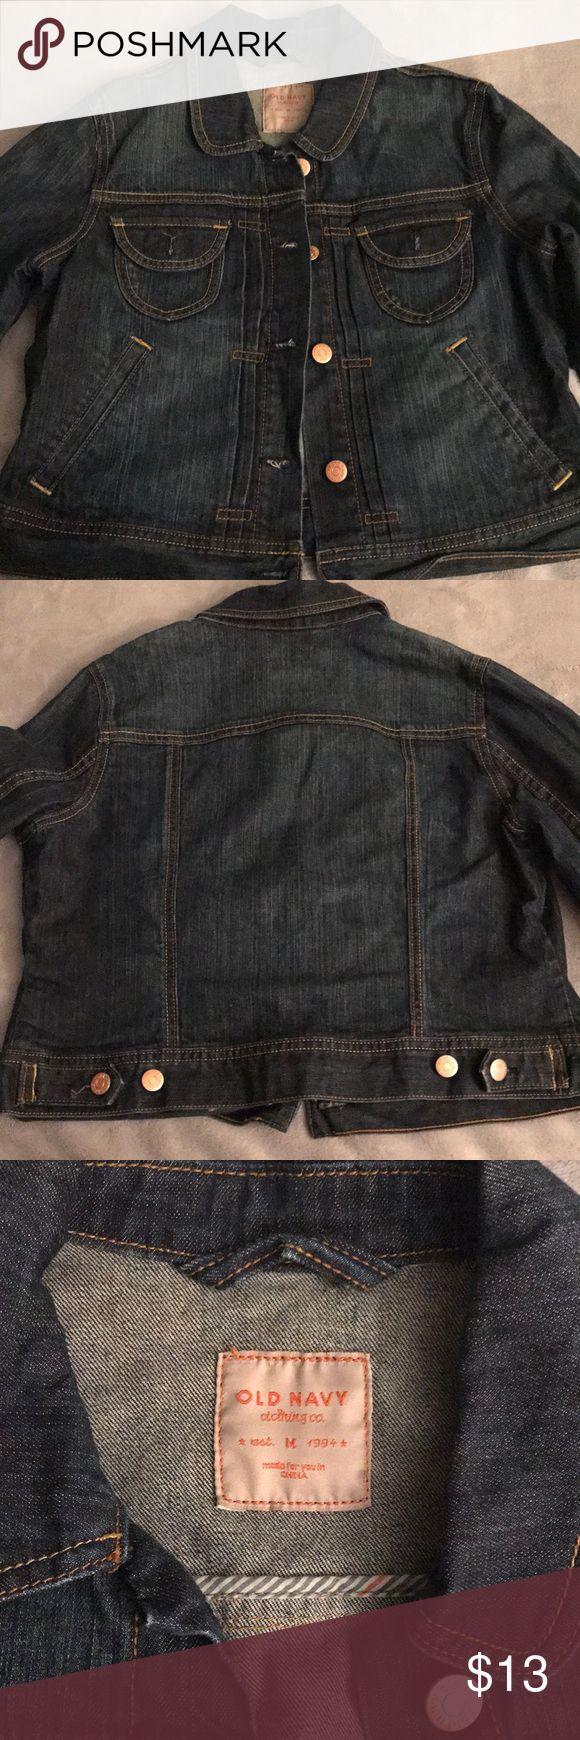 Old Navy Women's Jean Jacket. Size M. Old Navy Women's Jean Jacket. Size M. Old Navy Jackets & Coats Jean Jackets